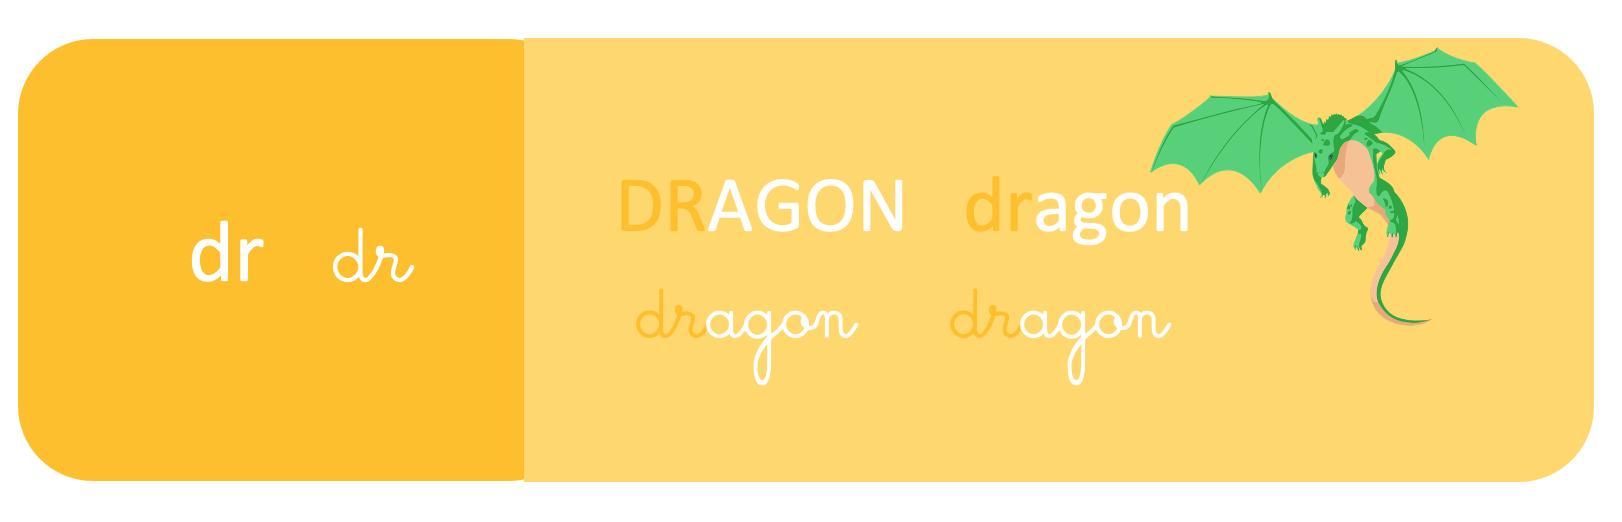 dr - dragon - schoolmouv - apprentissage de la lecture - CP